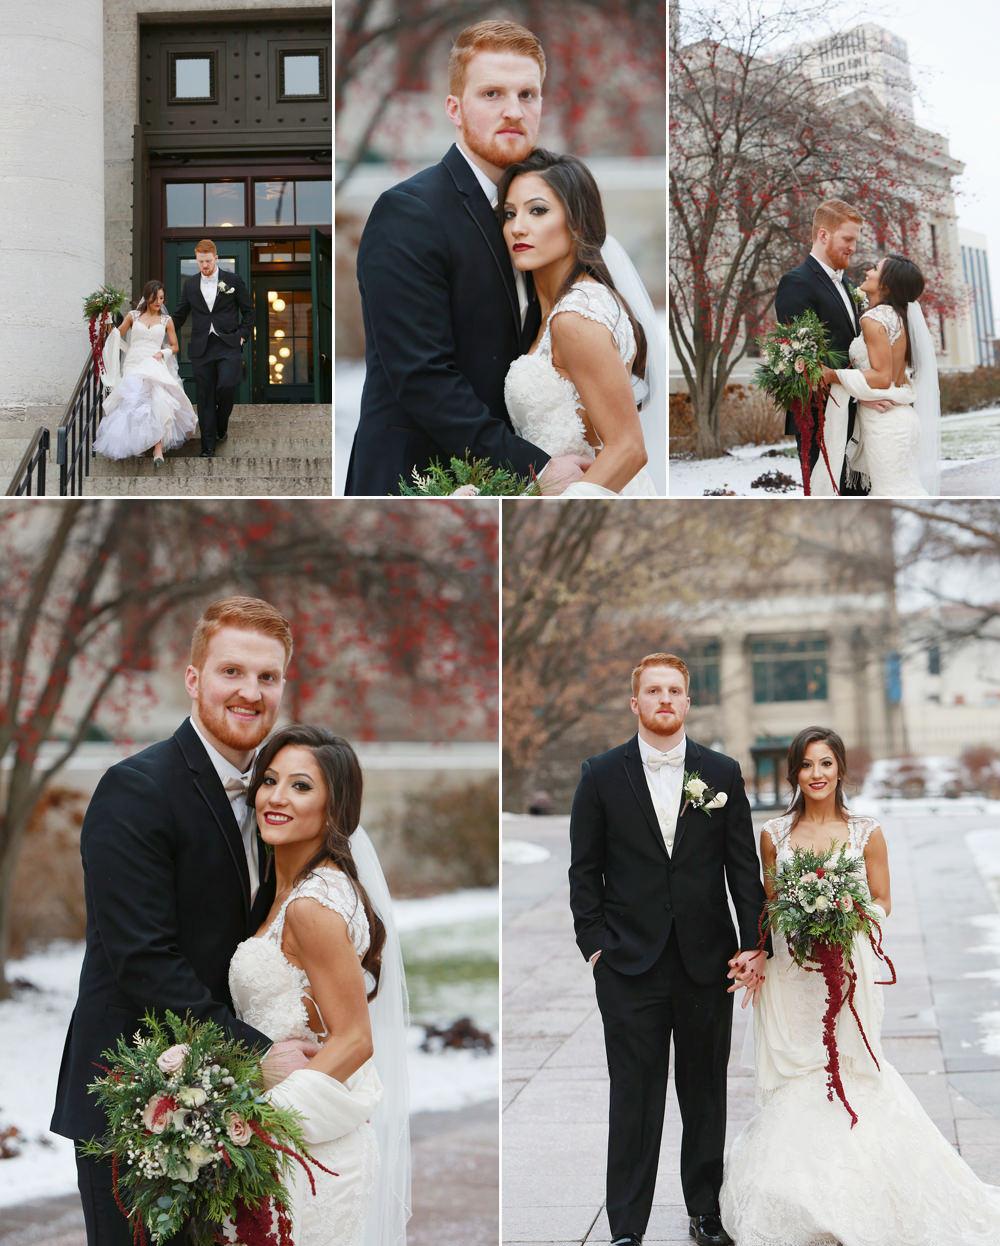 columbus-ohio-wedding-photographer-red-gallery-photography-ivory-room22